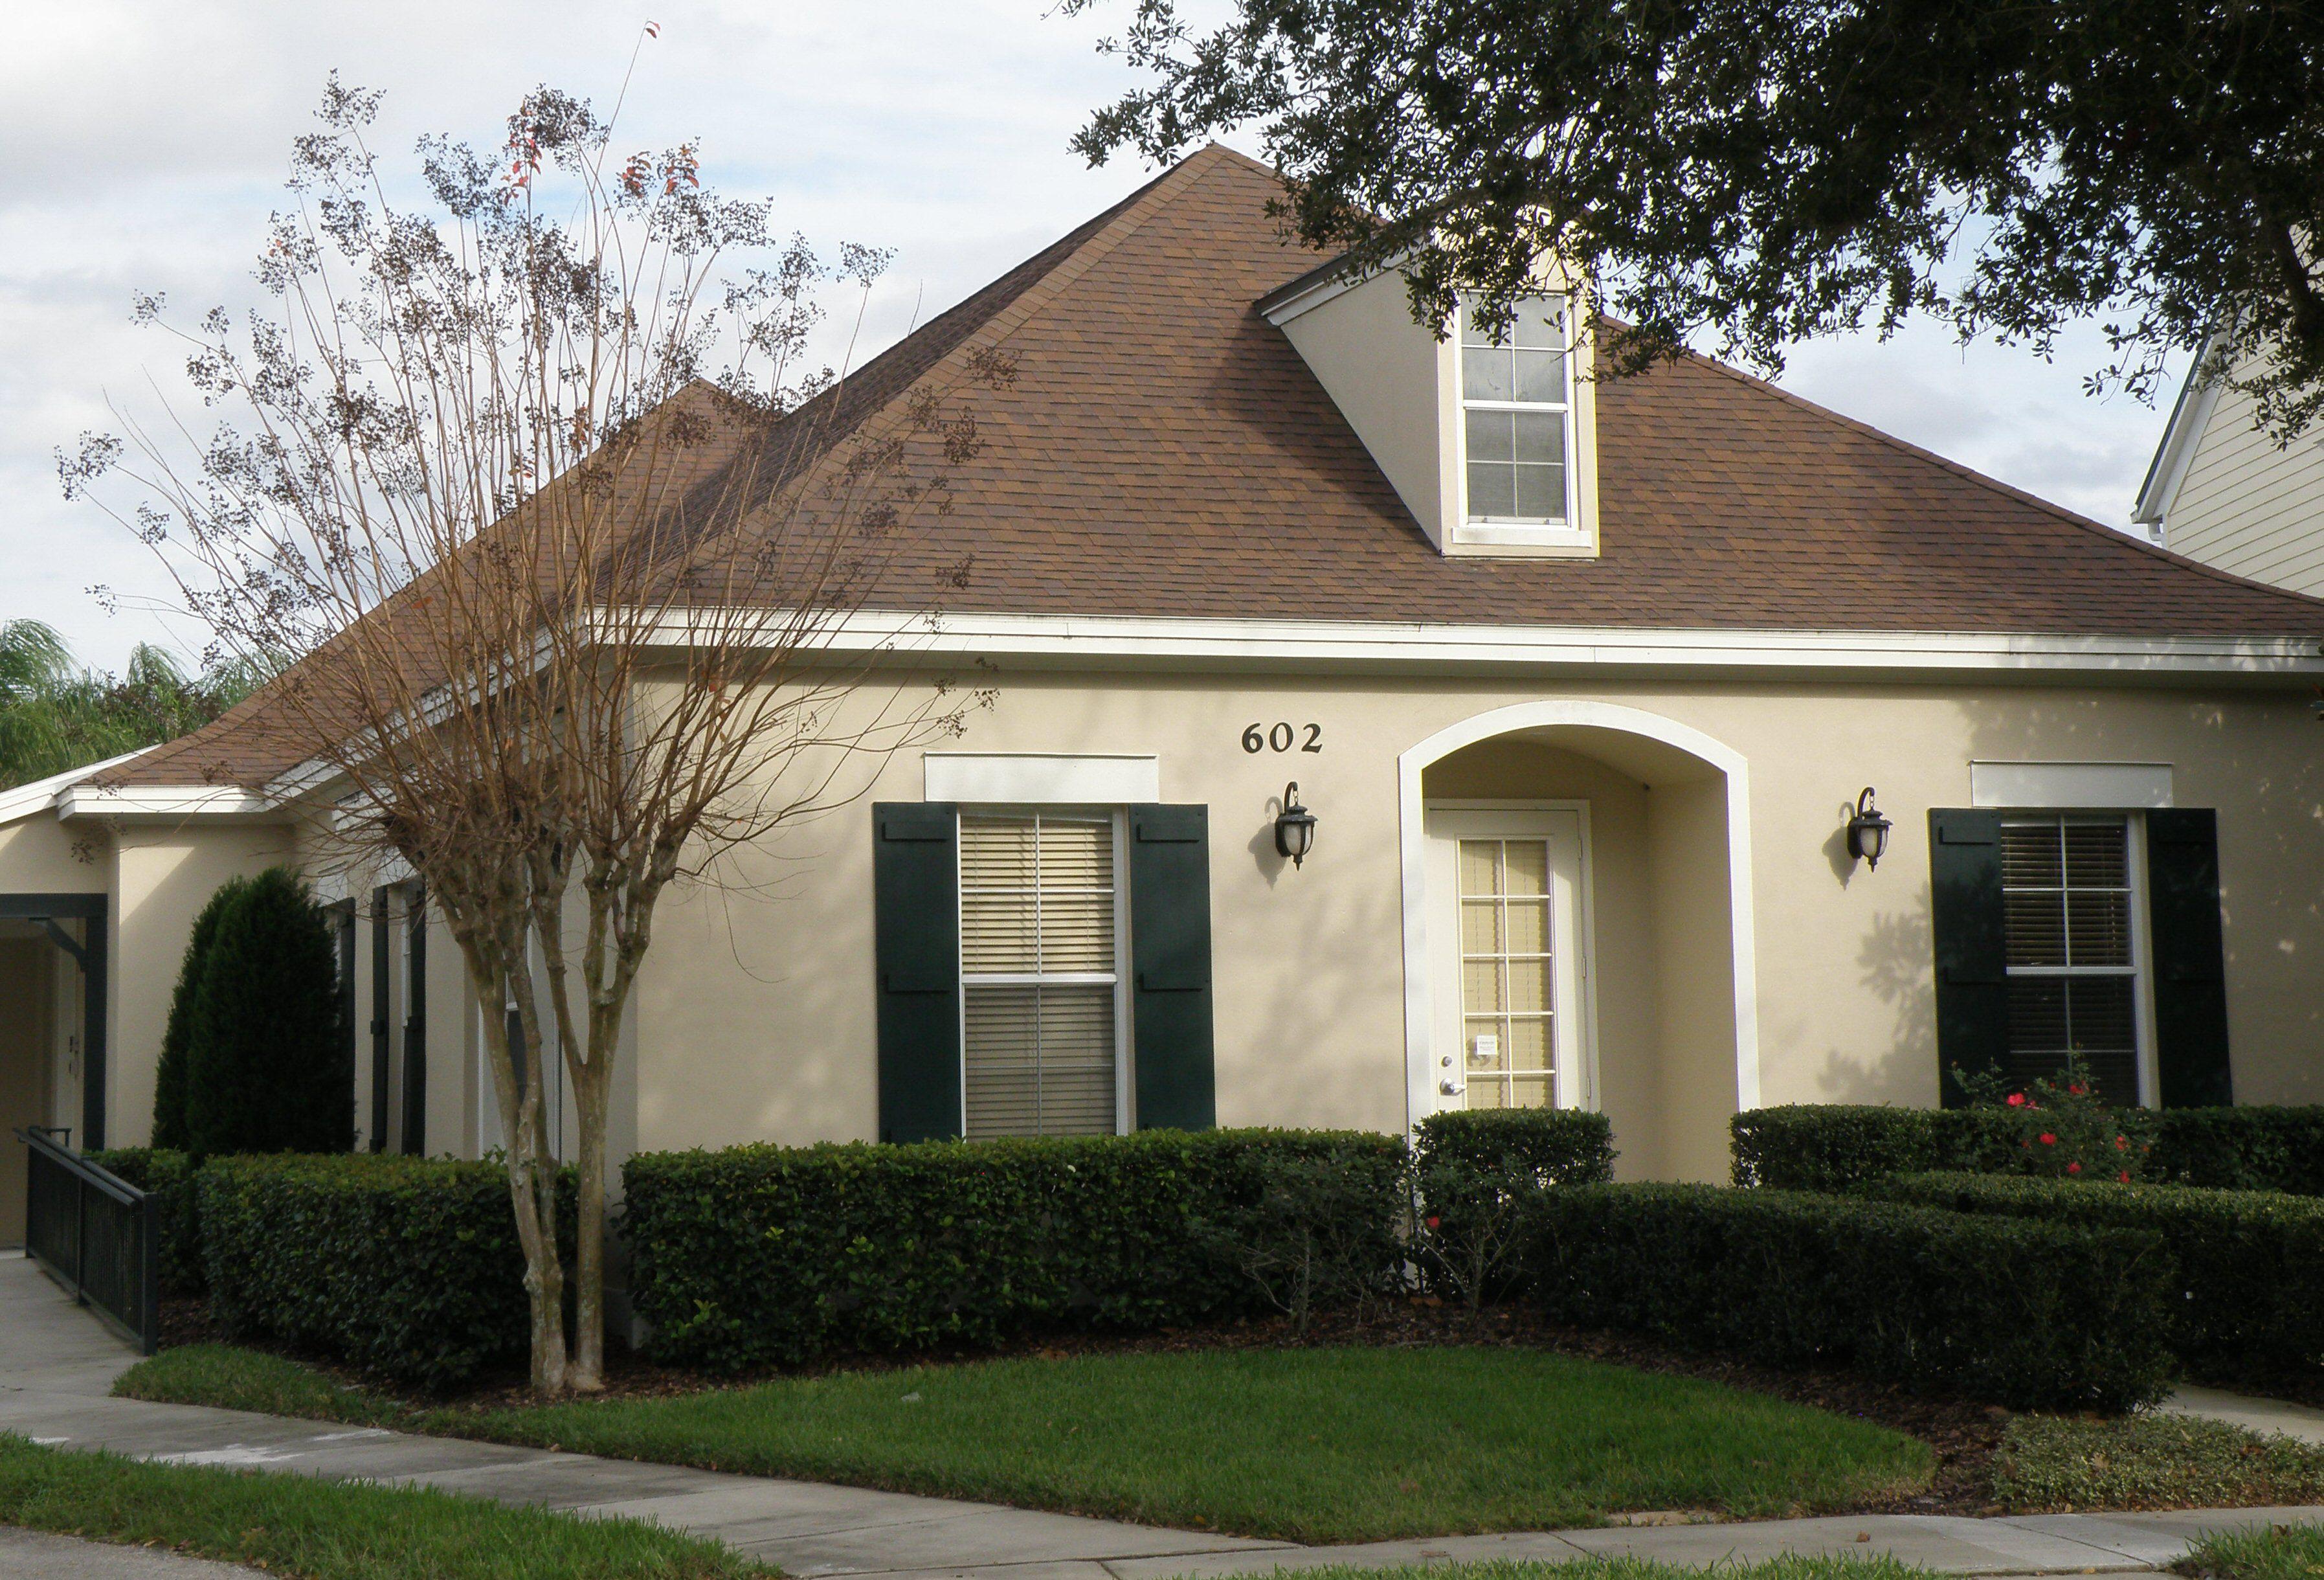 Neighborhood house in Celebration, Florida